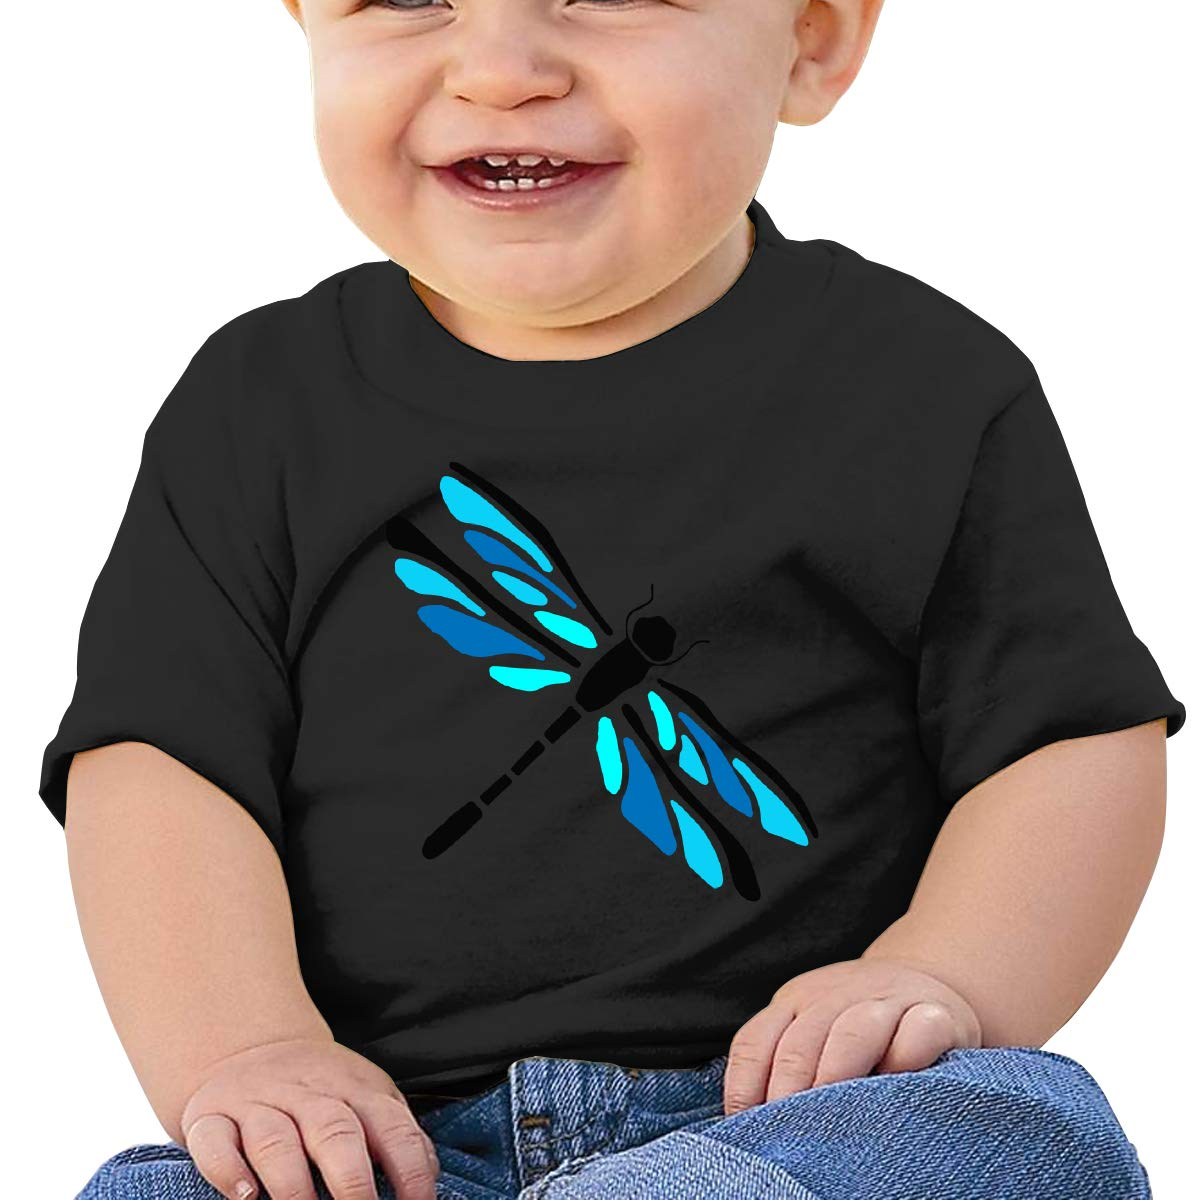 Dragonfly Funny Newborn Baby Newborn Short Sleeve T-Shirt 6-24 Month Soft Tops